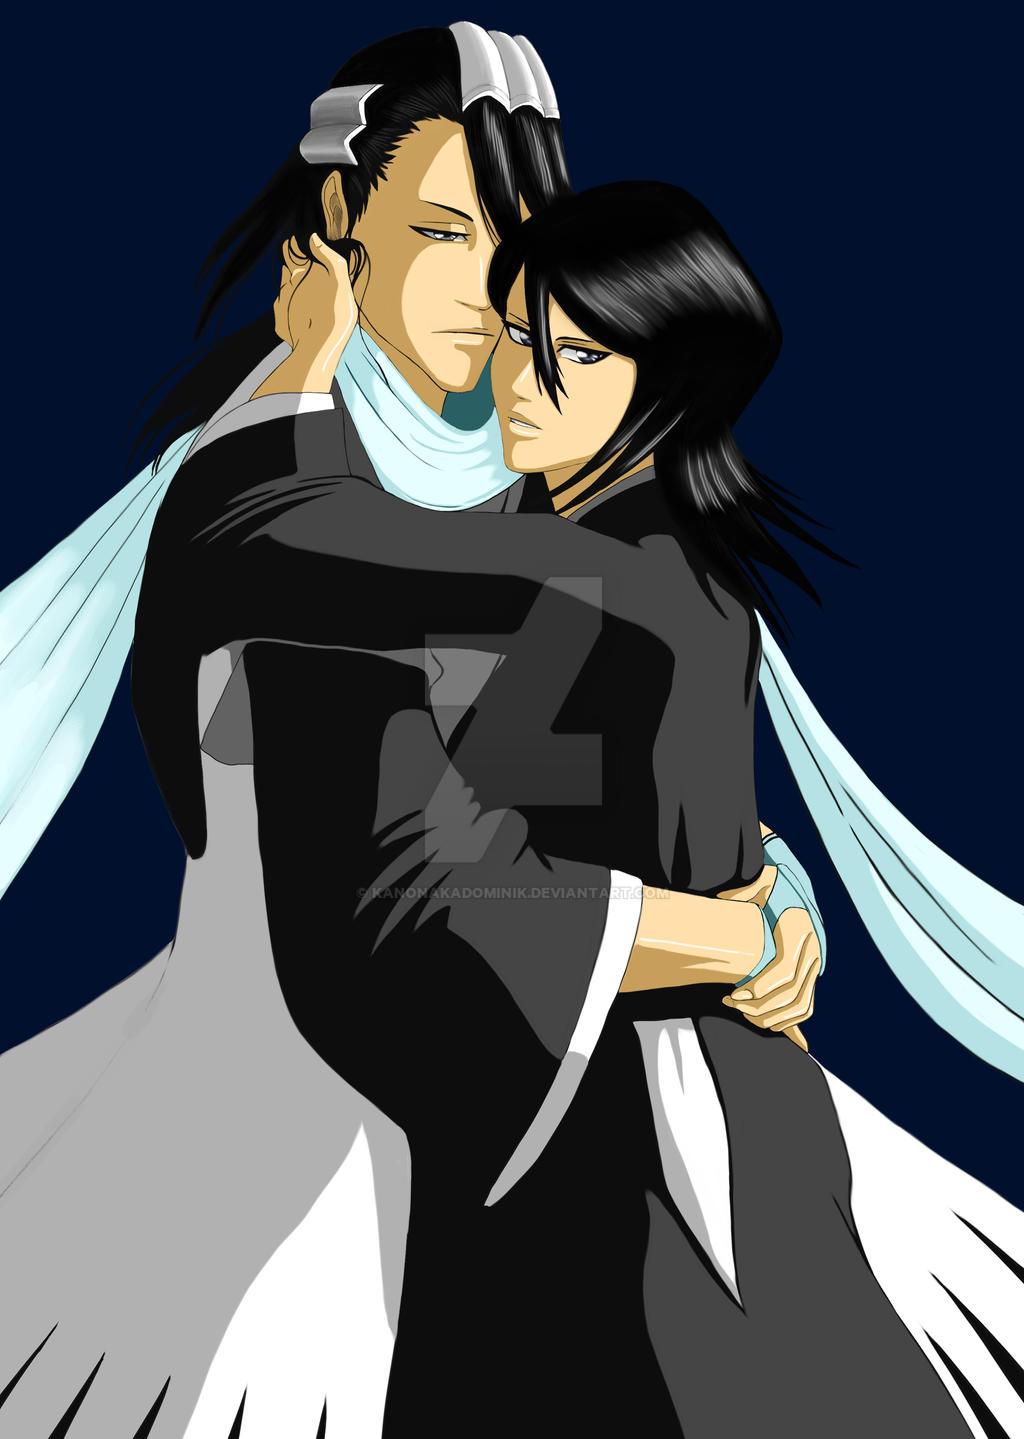 rukia and byakuya relationship goals